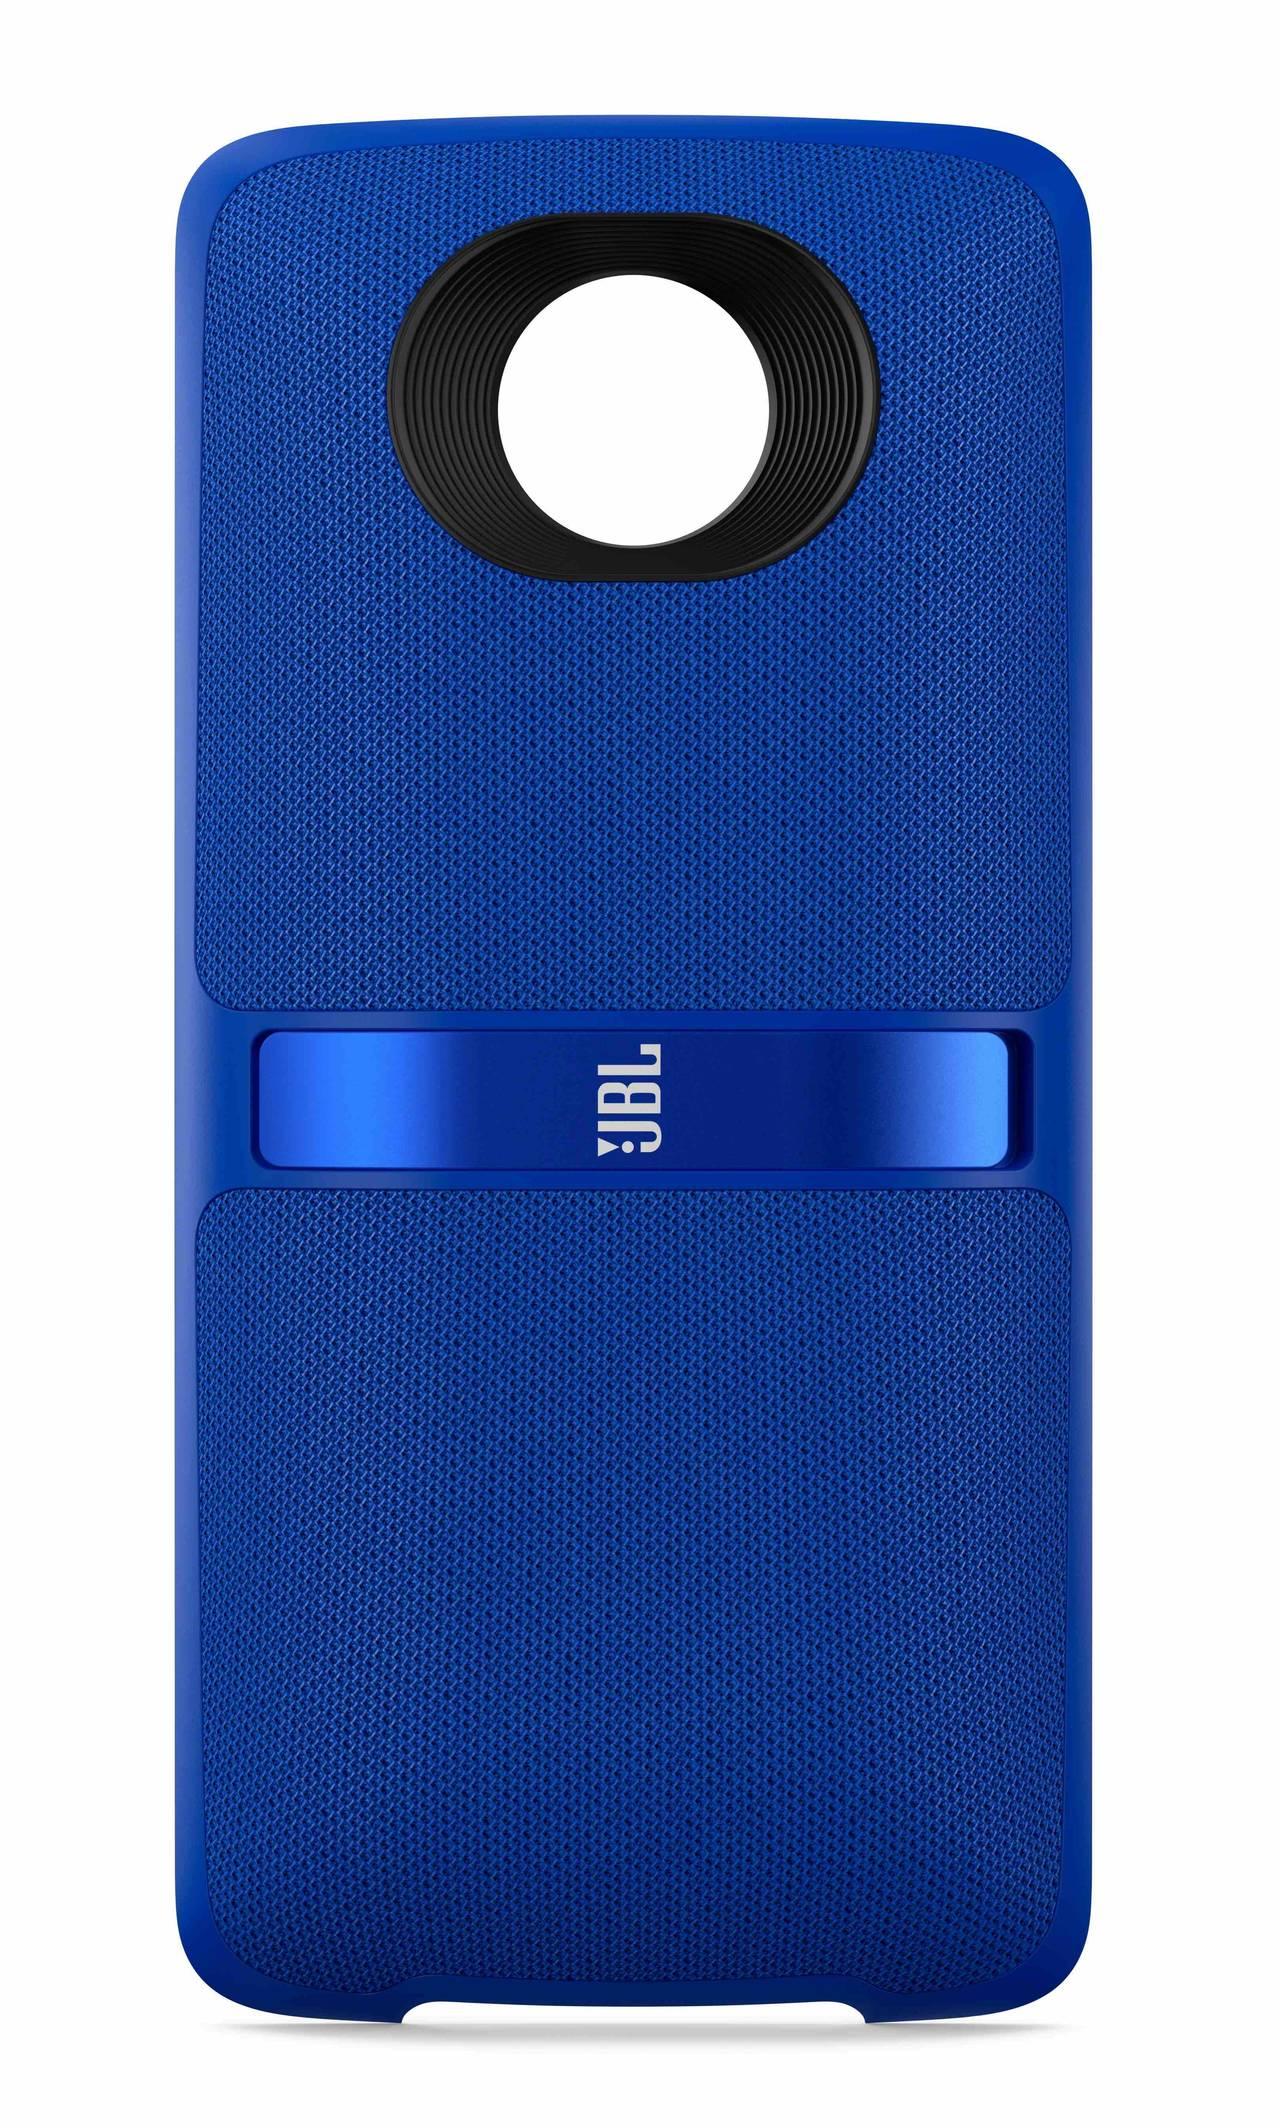 Moto Z JBL SoundBoost 2 Blue